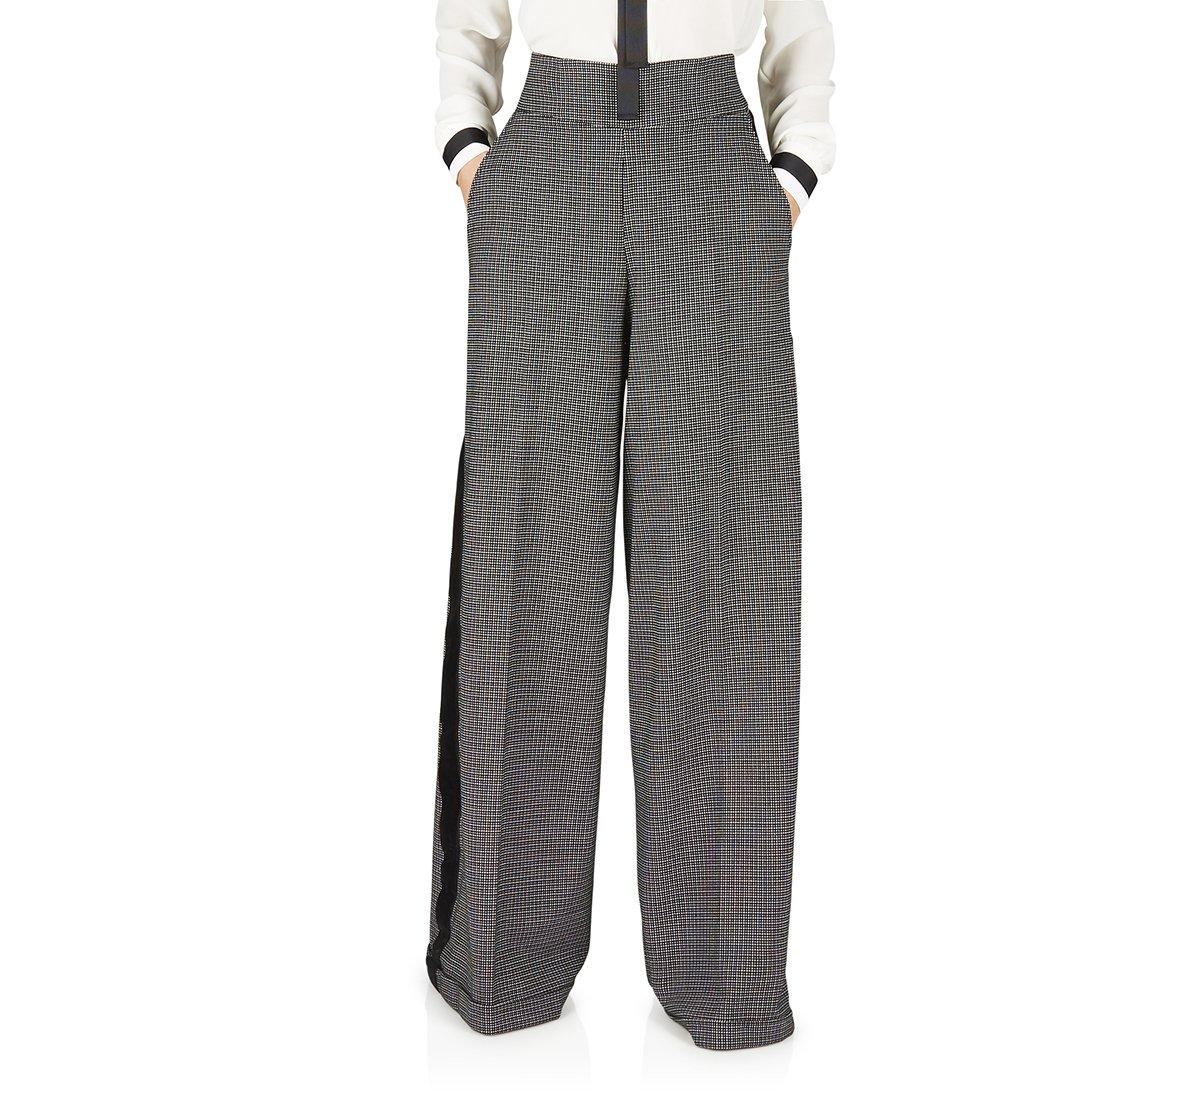 Pantalone pied de poul in tessuto